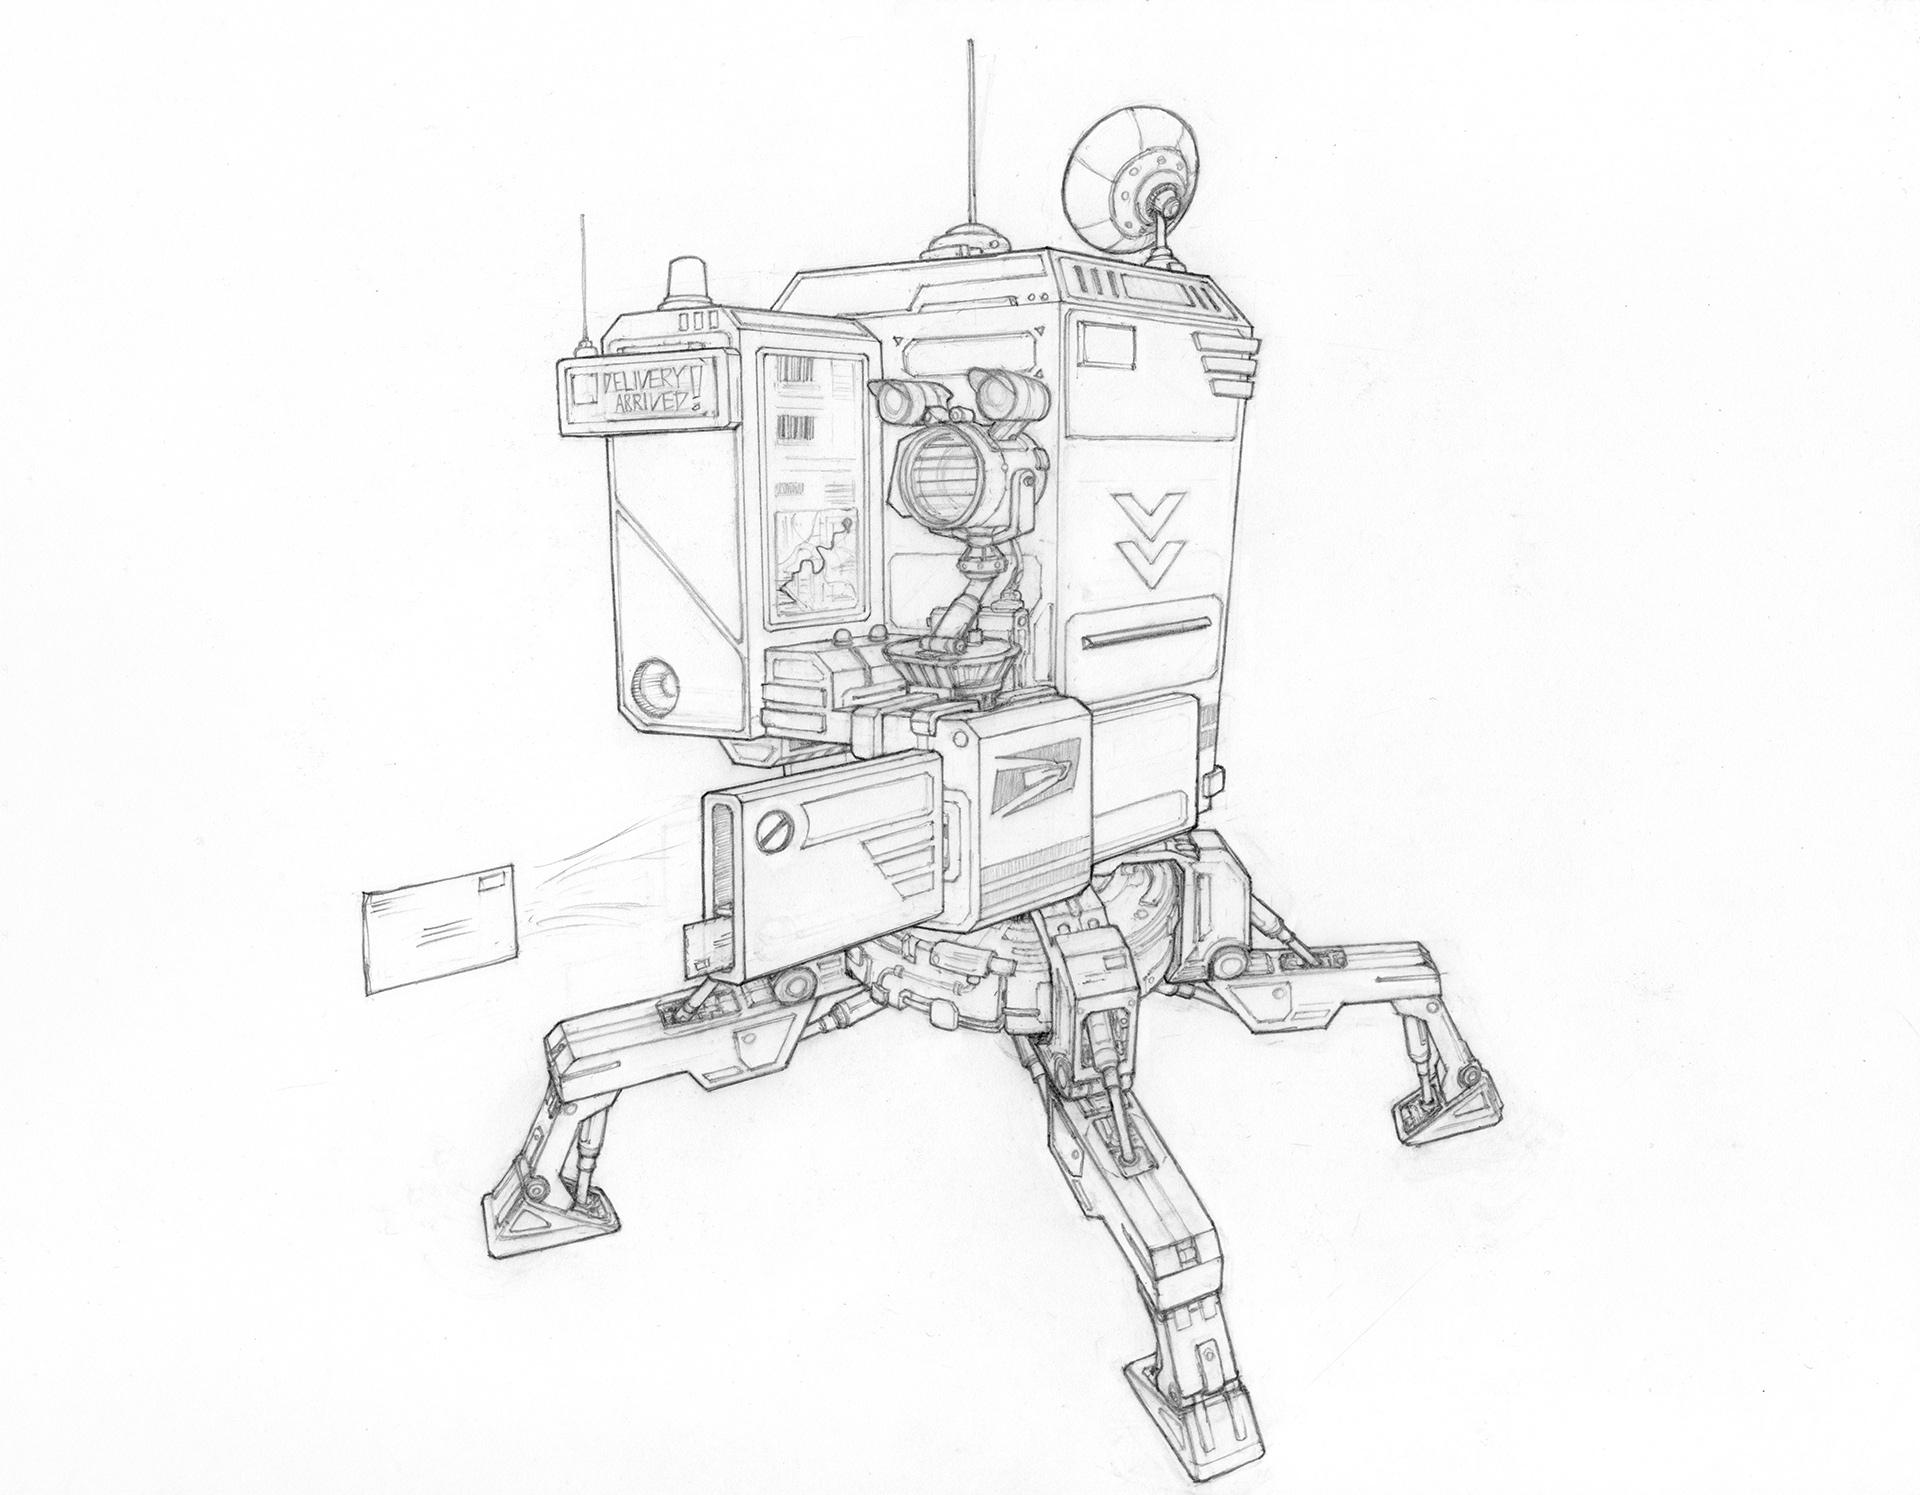 mailbot 2